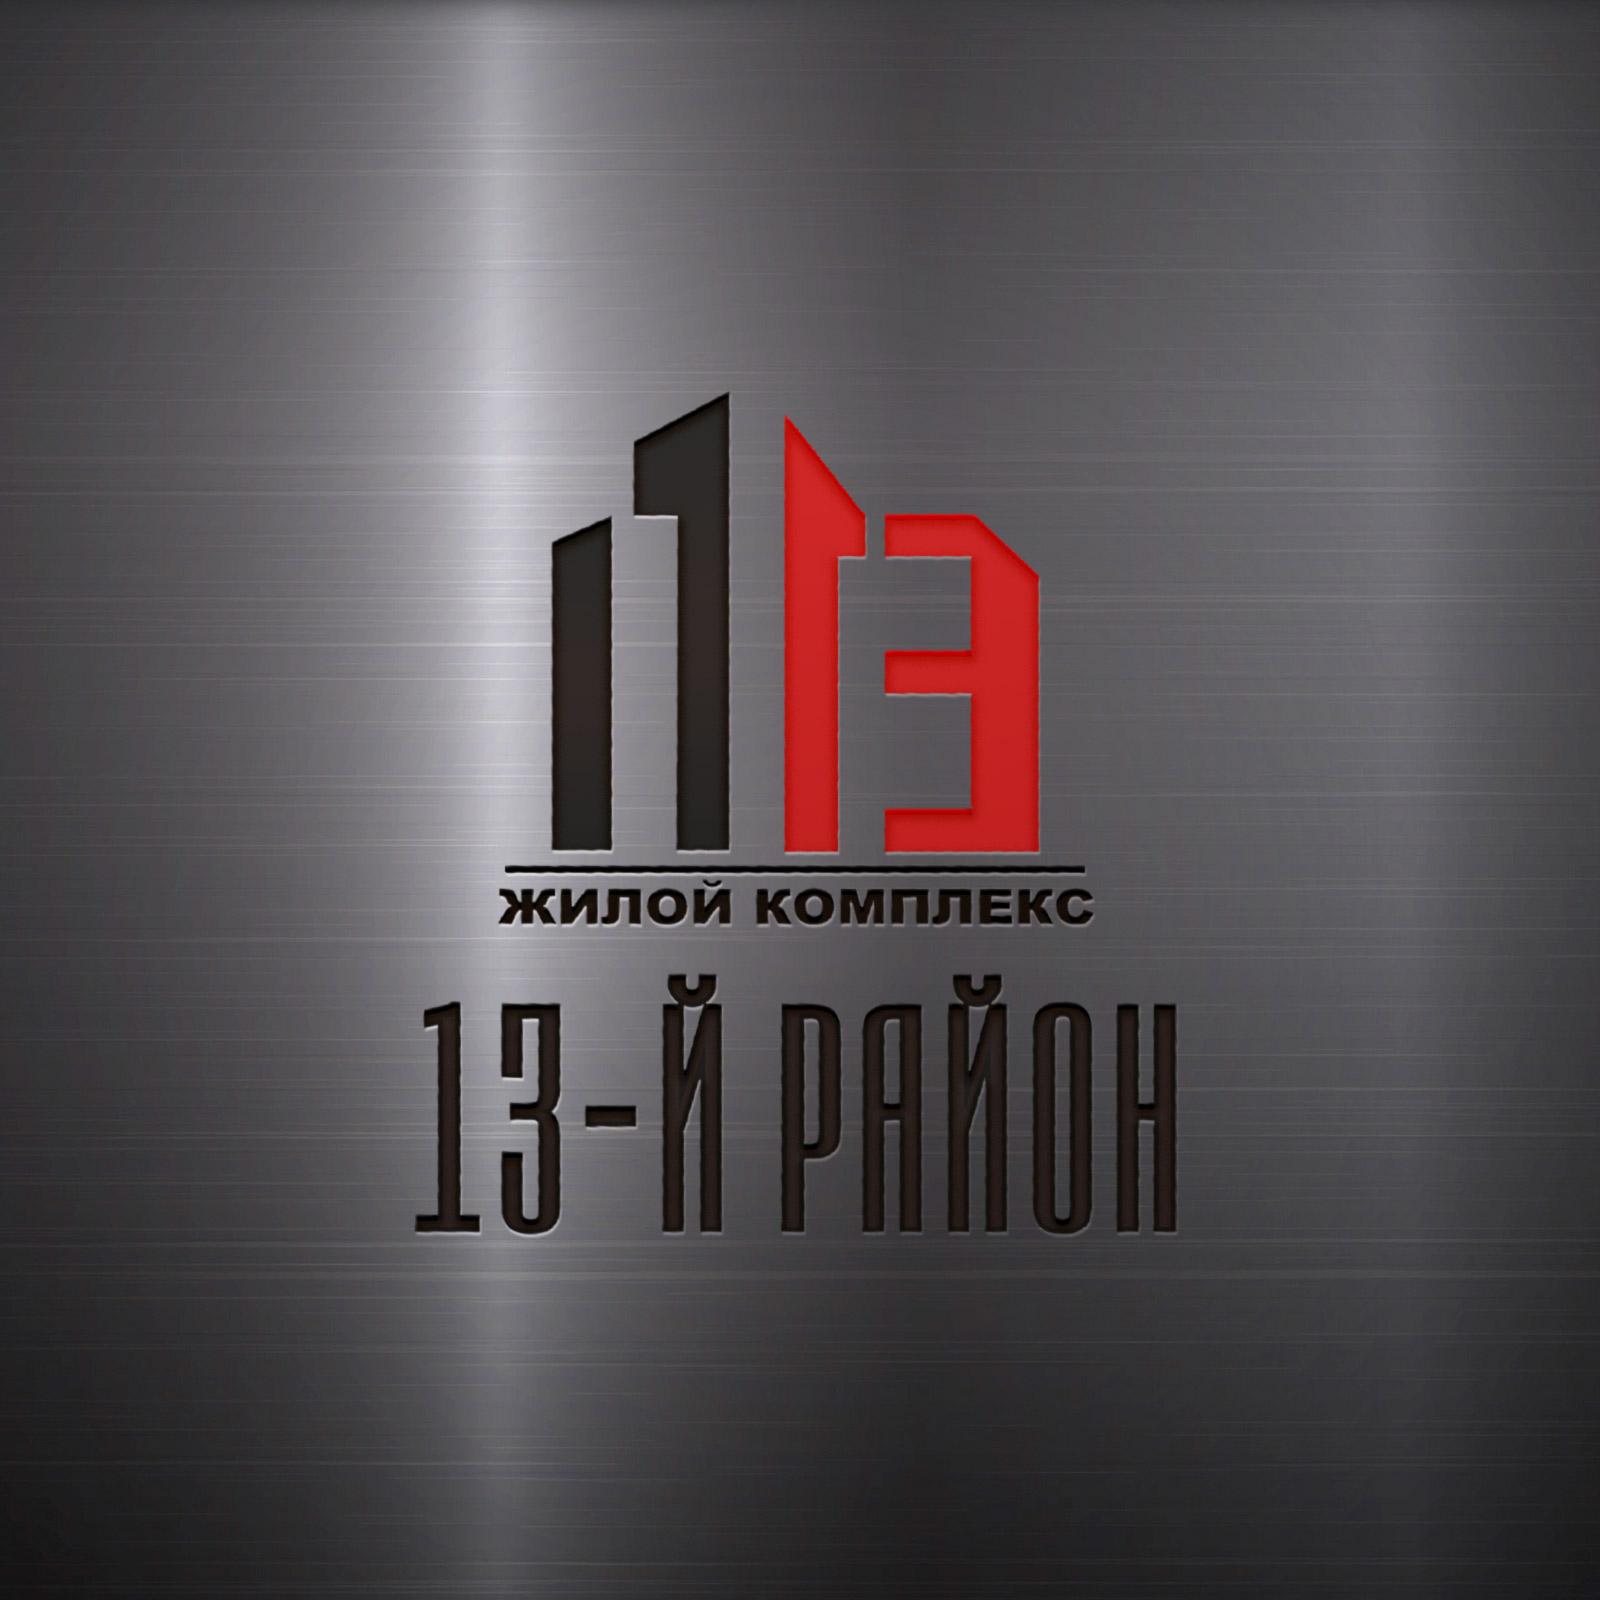 Разработка логотипа и фирменный стиль фото f_005596fb6557d235.jpg